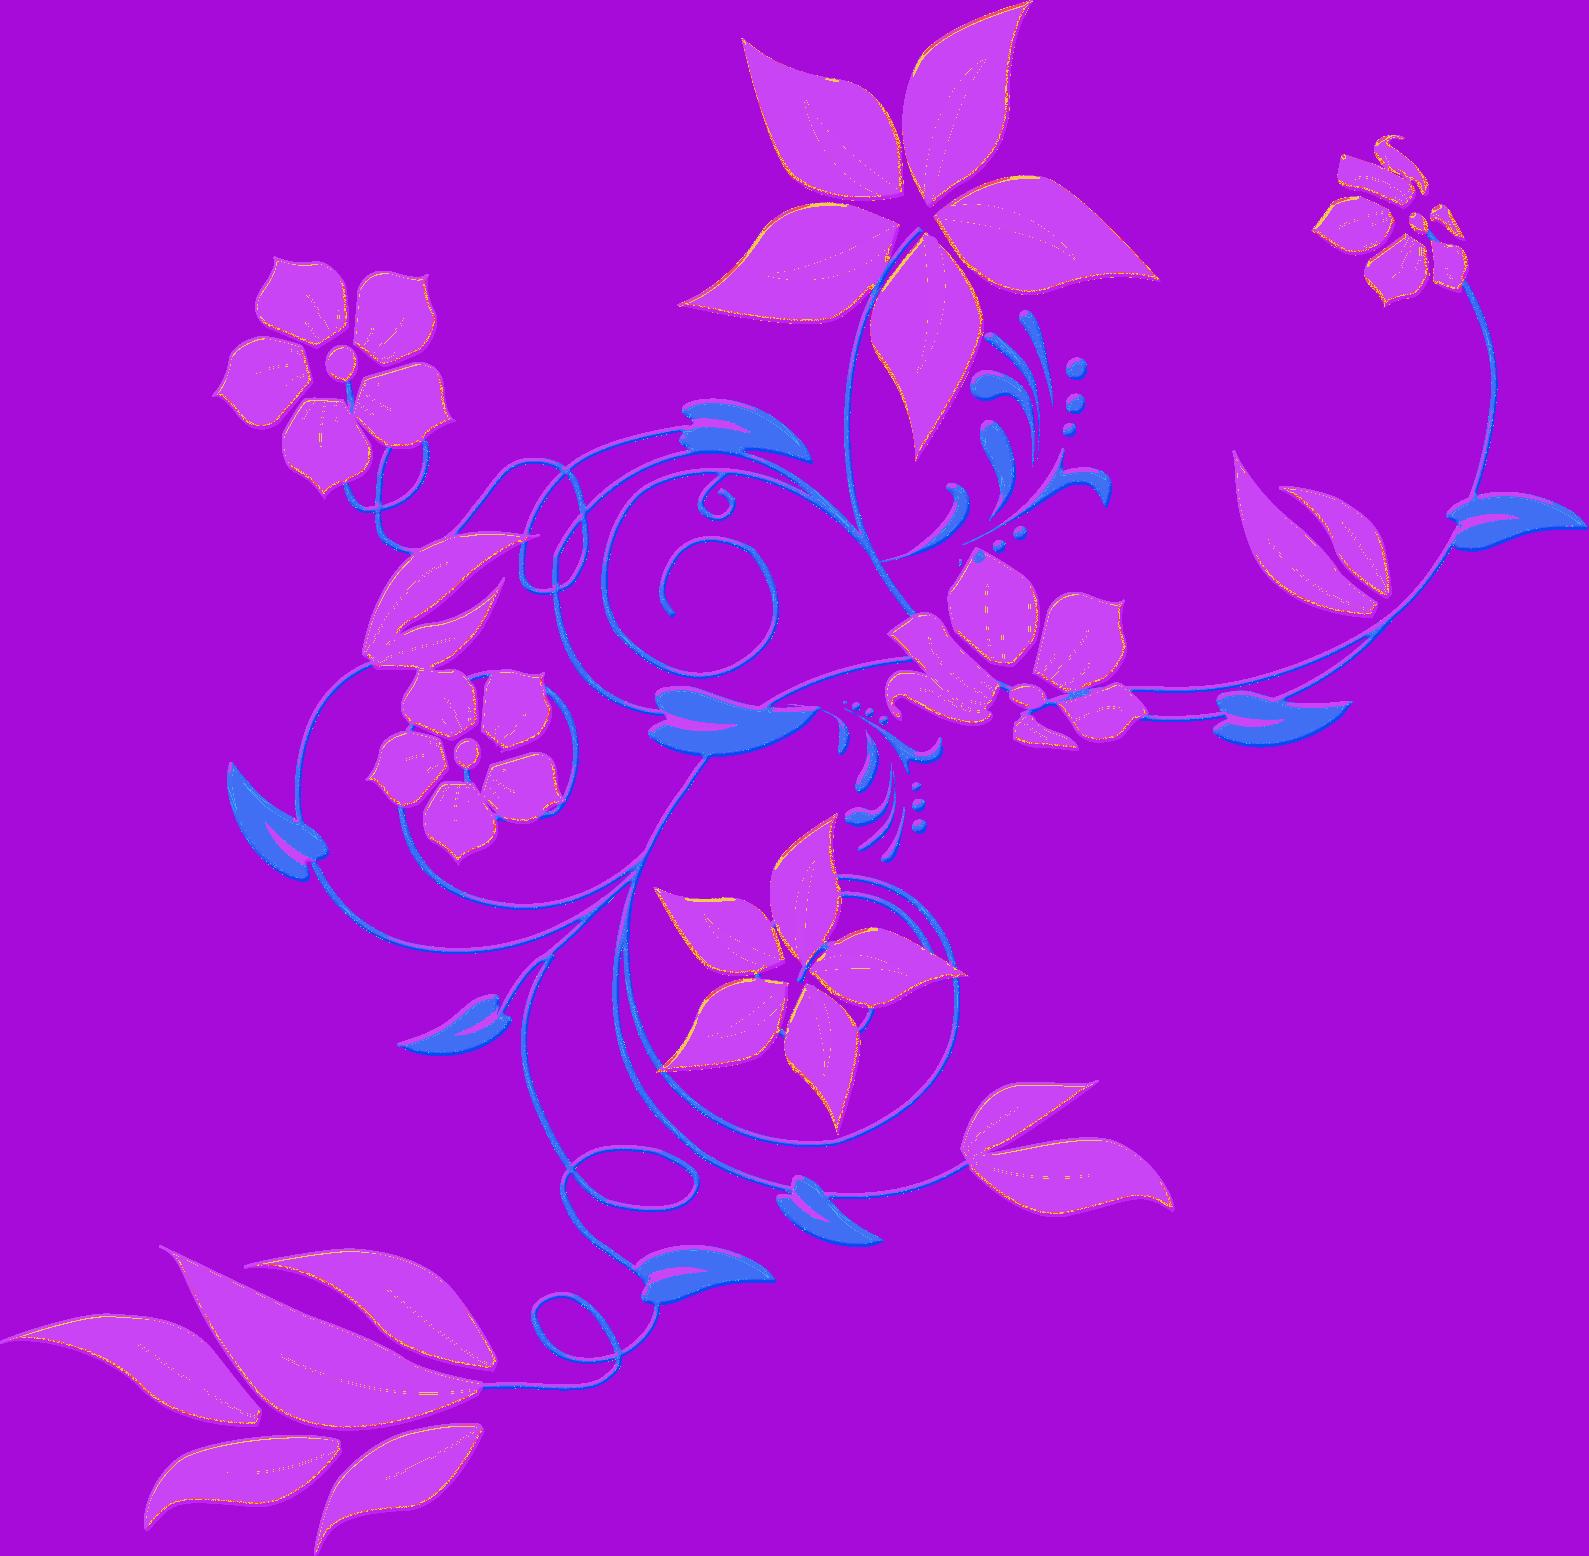 Free wedding flower clipart vector download Flower 75 | Free Images at Clker.com - vector clip art online ... vector download